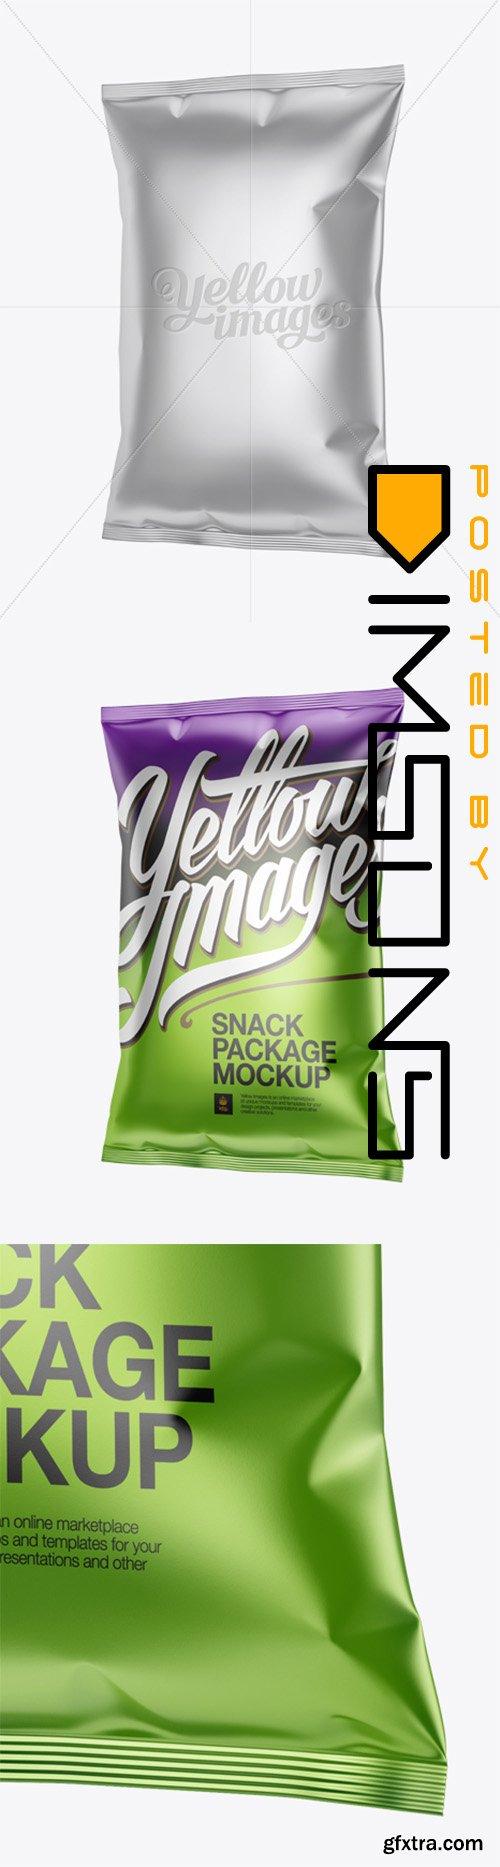 Matte Metallic Snack Package Mockup - Halfside view 13933